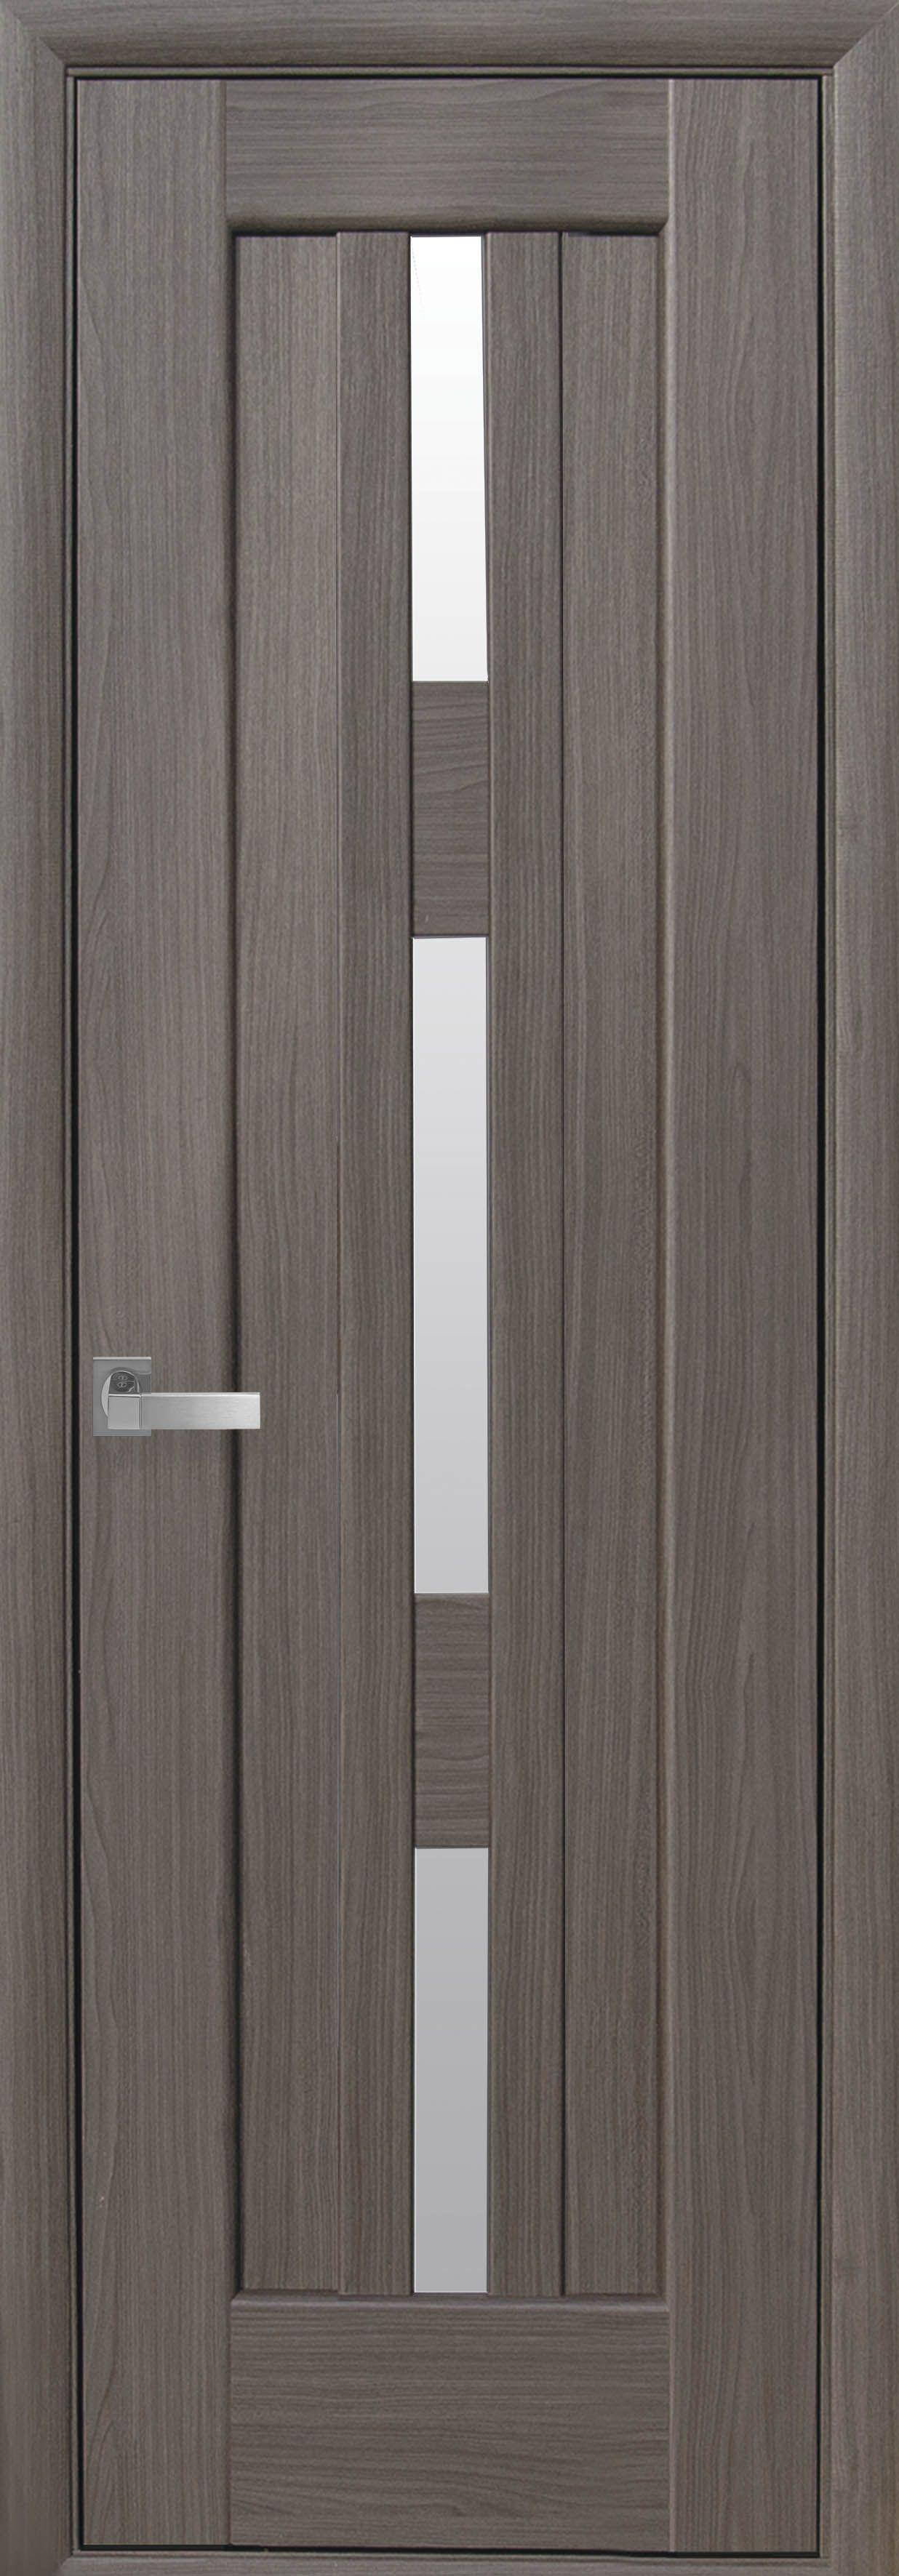 Межкомнатные двери Лаура (600мм) со стеклом сатин